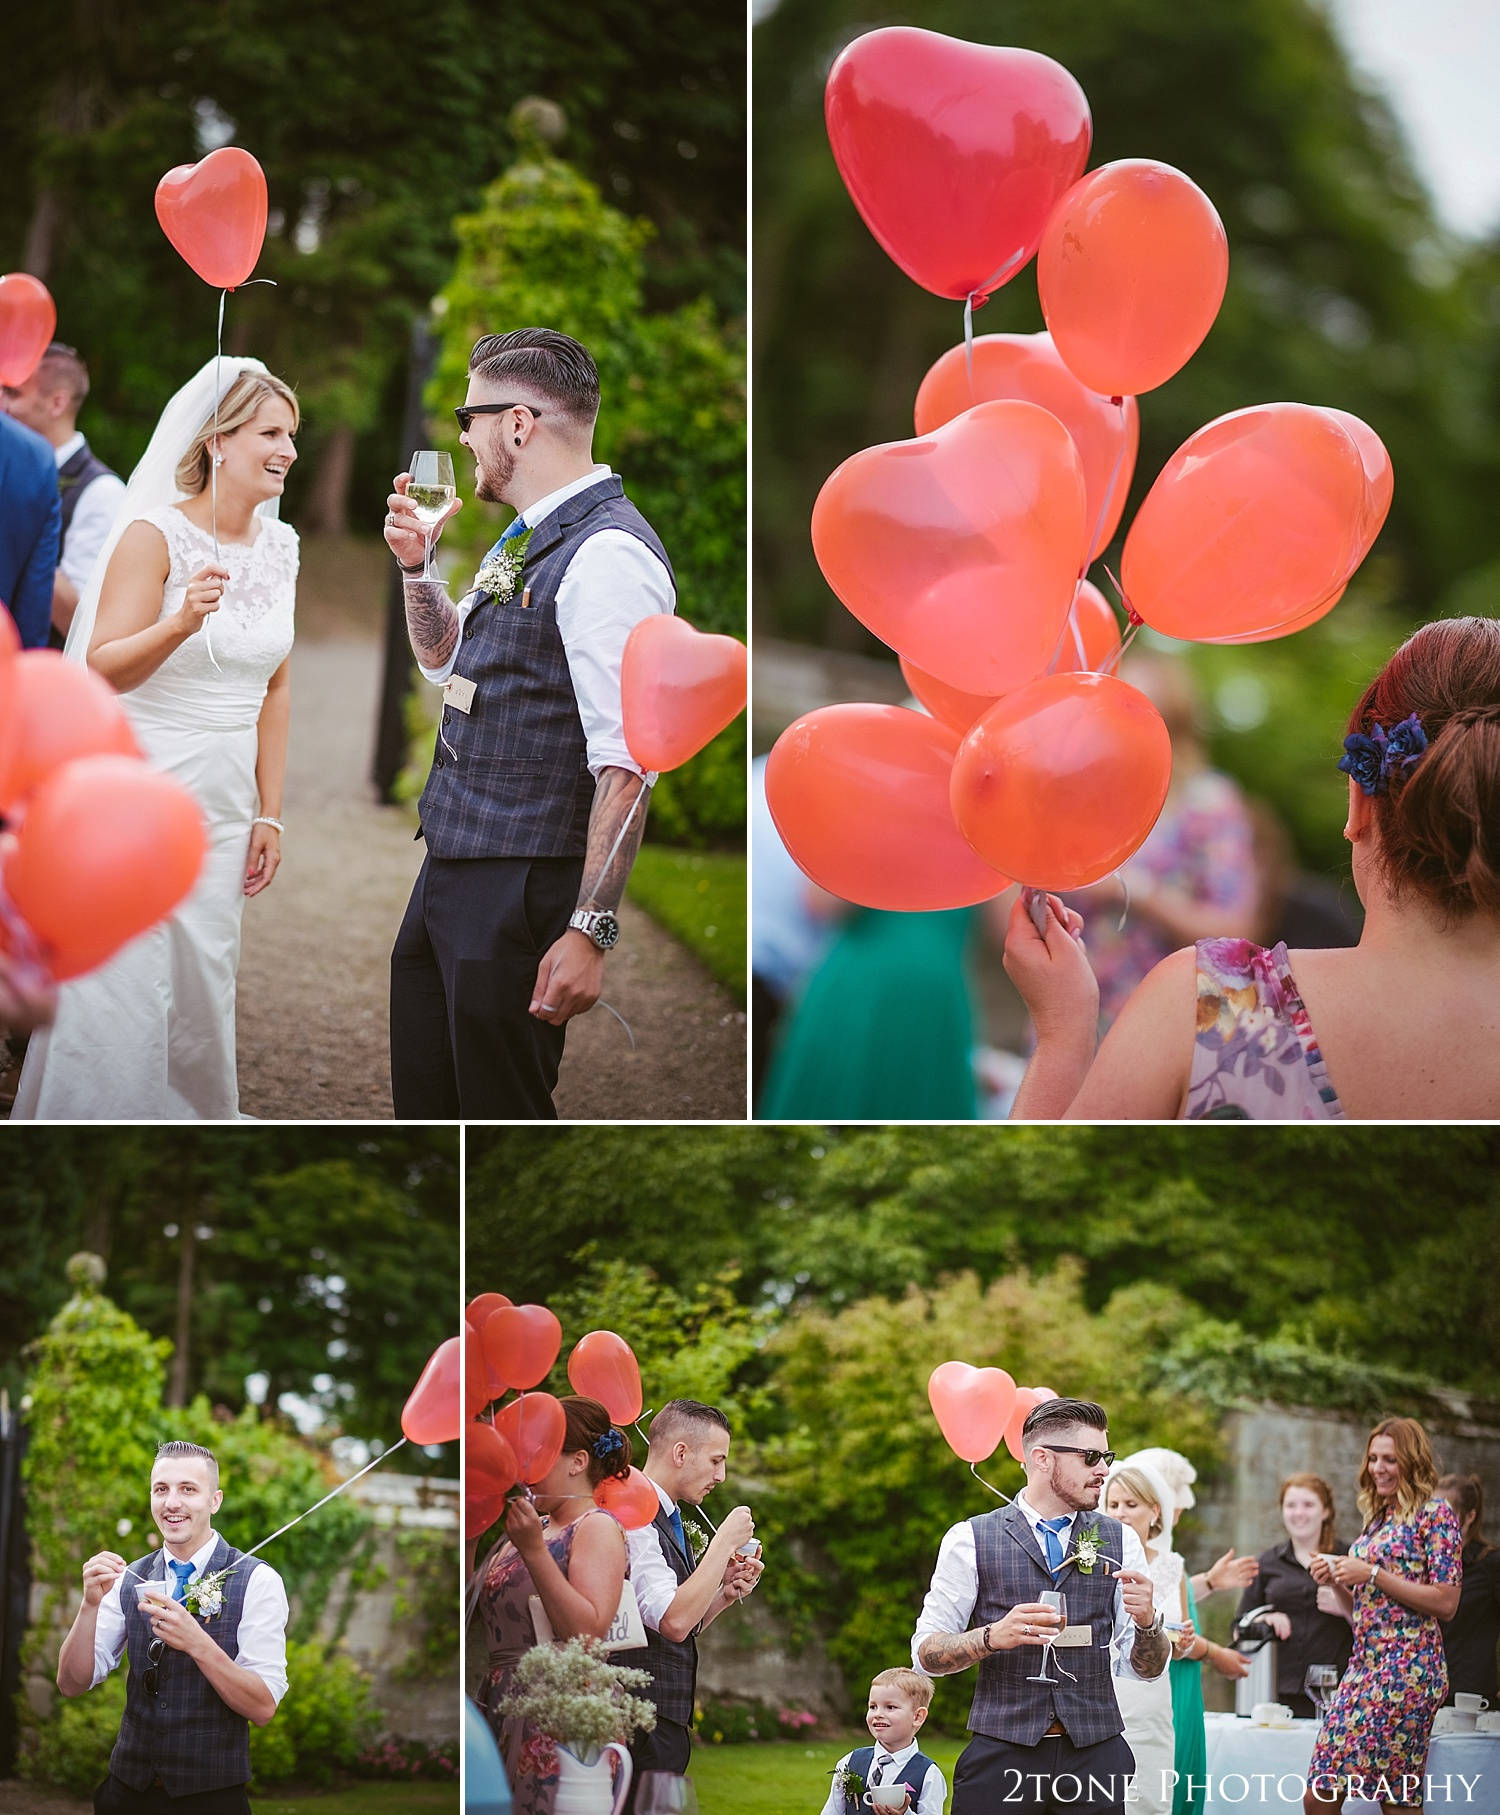 Wedding balloons.  Wedding photography at Guyzance Hall by wedding photographers www.2tonephotography.co.uk